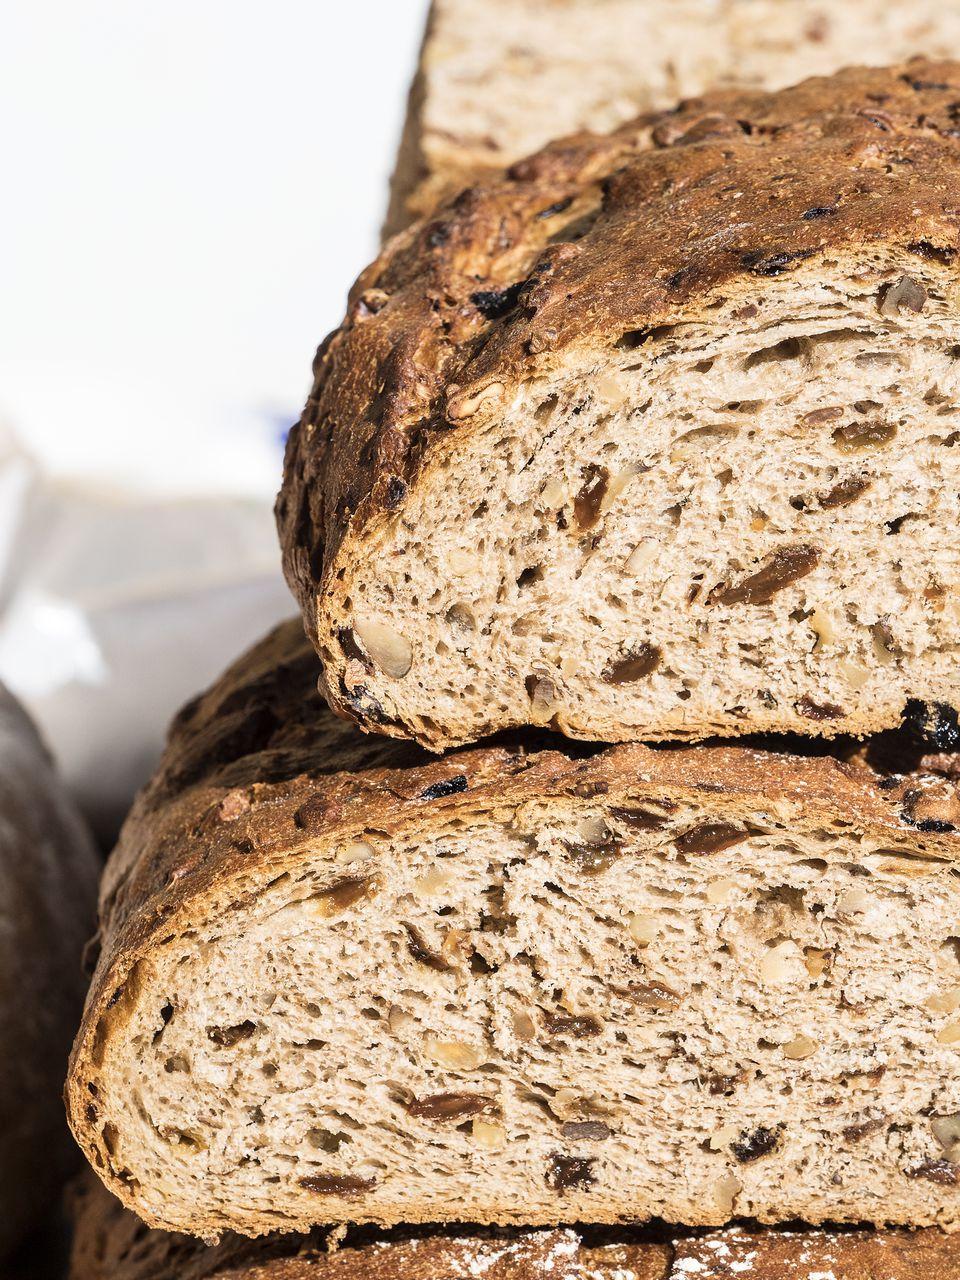 Easy Russian / Latvian Rye Bread Recipe - Rizhsky Khleb